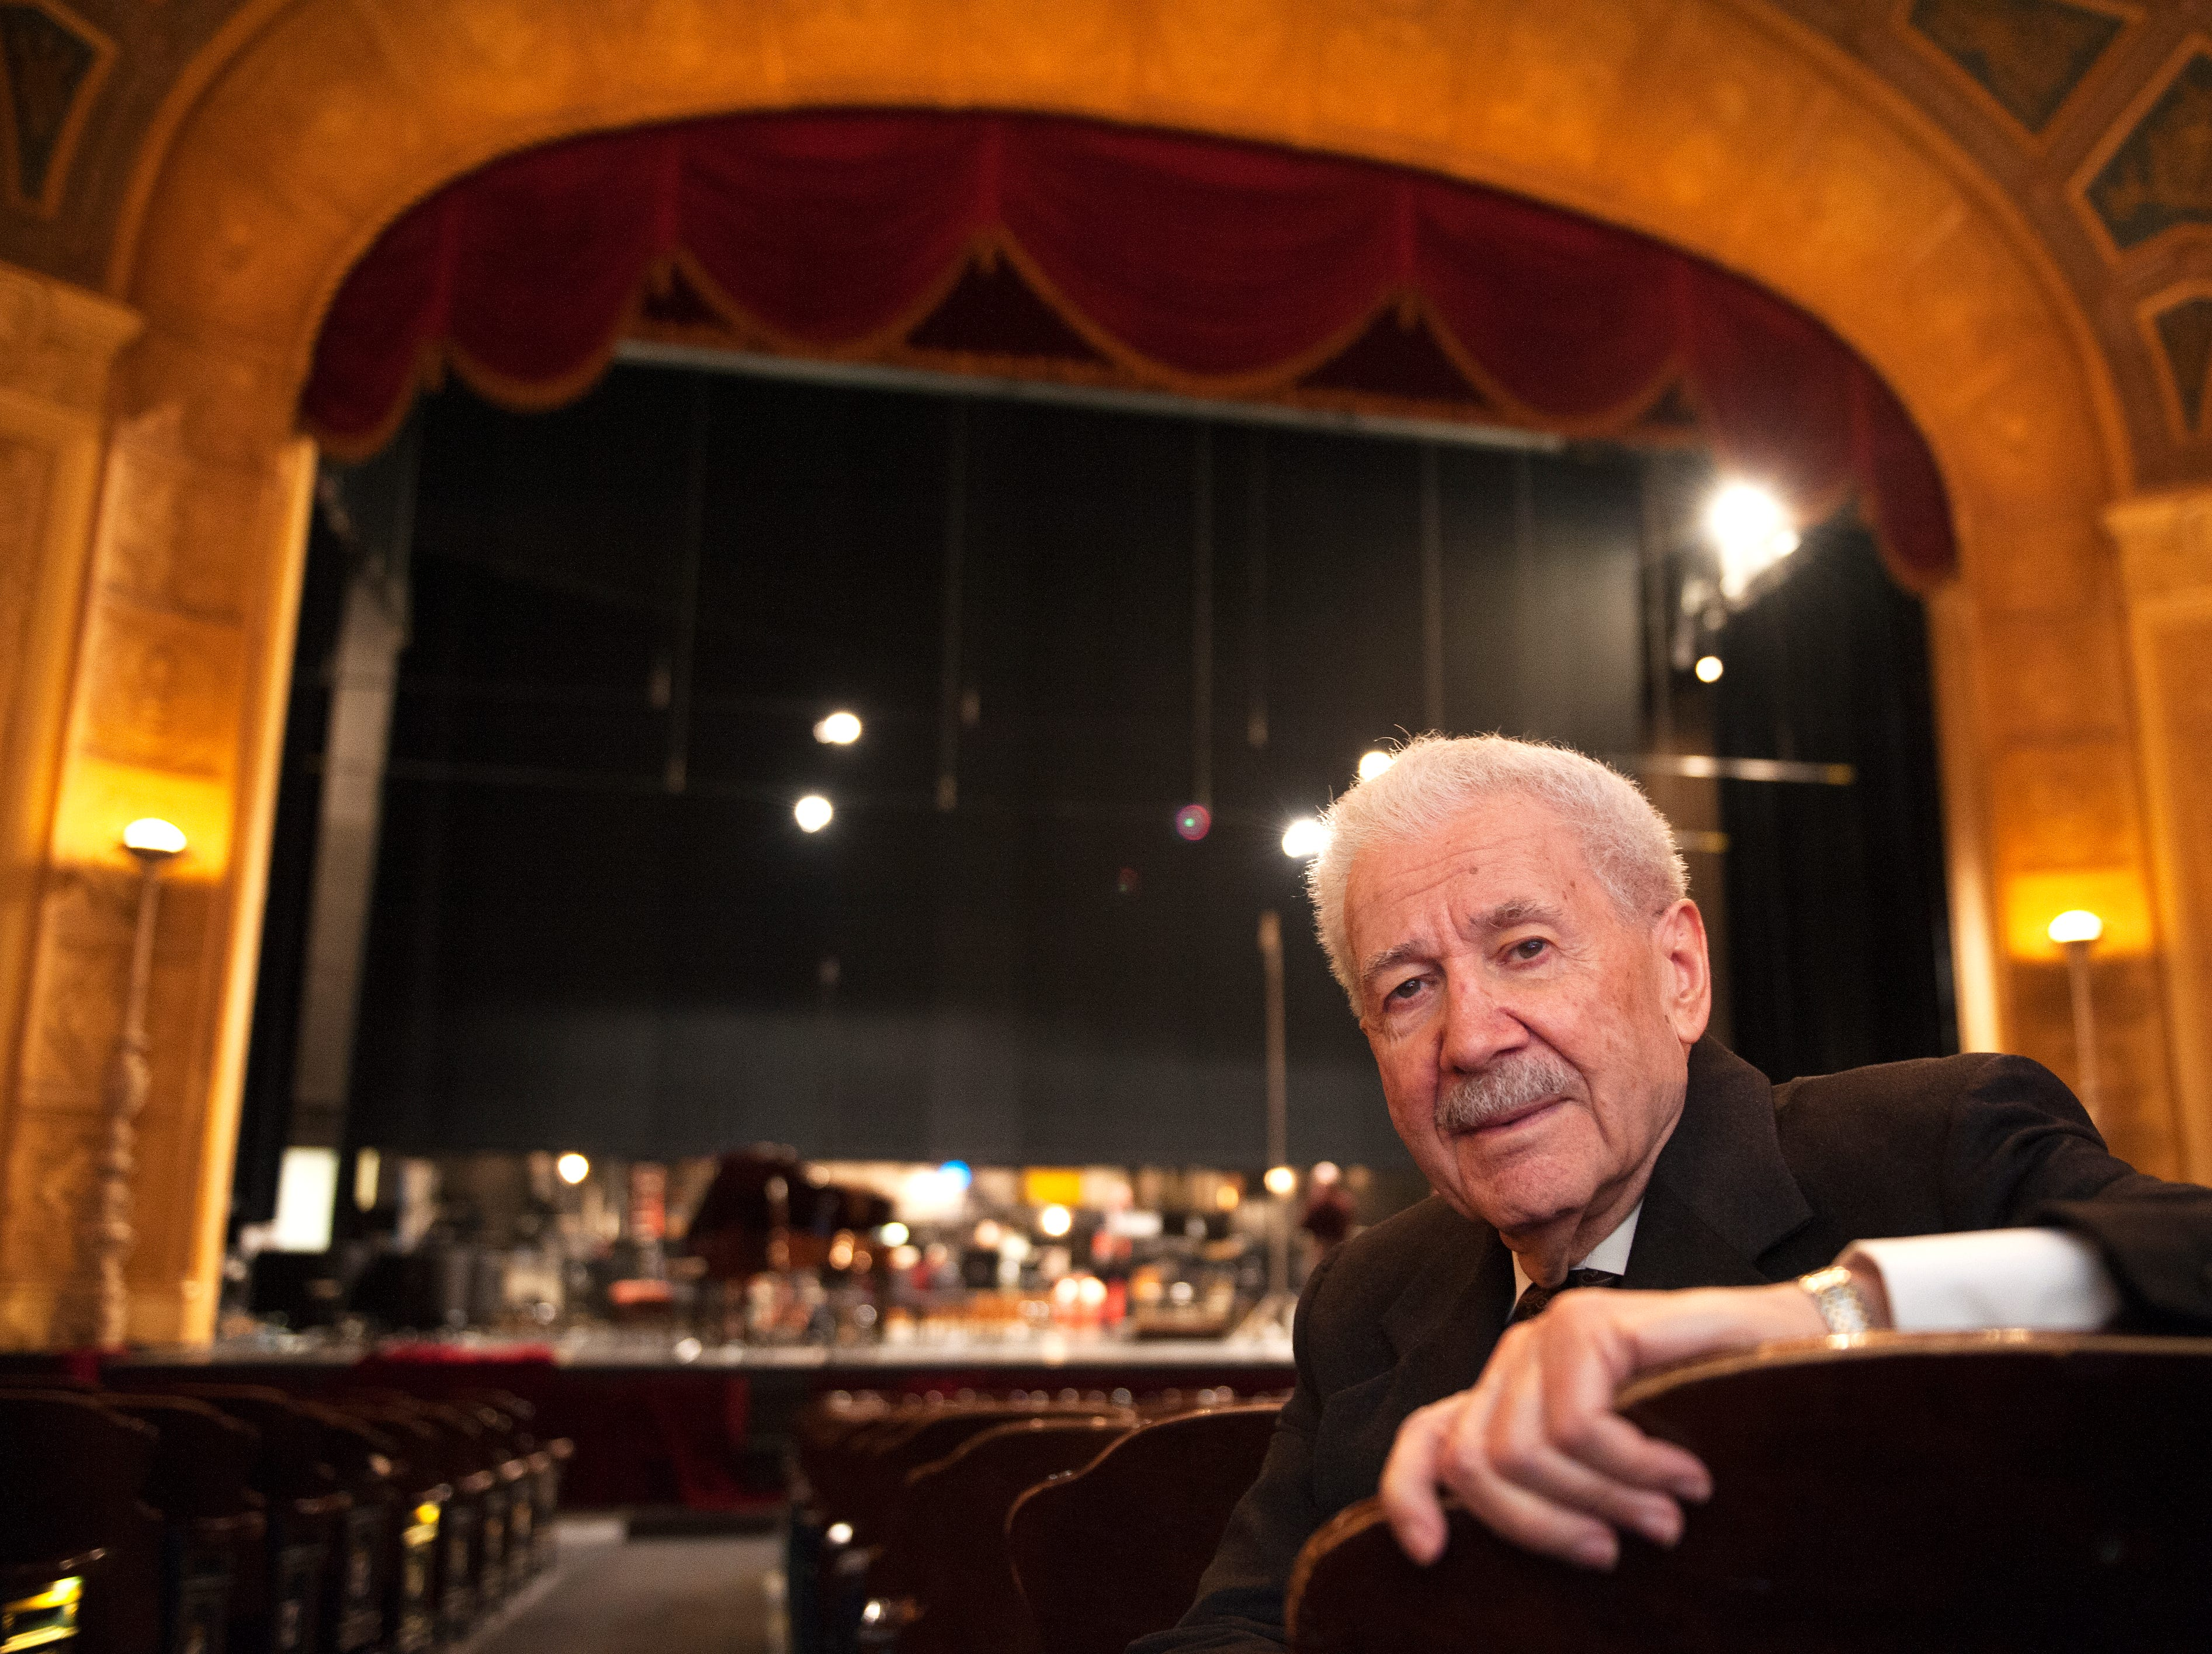 Michigan Opera Theatre artistic director David DiChiera inside the Detroit Opera House in Detroit on Friday, March 4, 2016. DiChiera founded MOT in 1971.